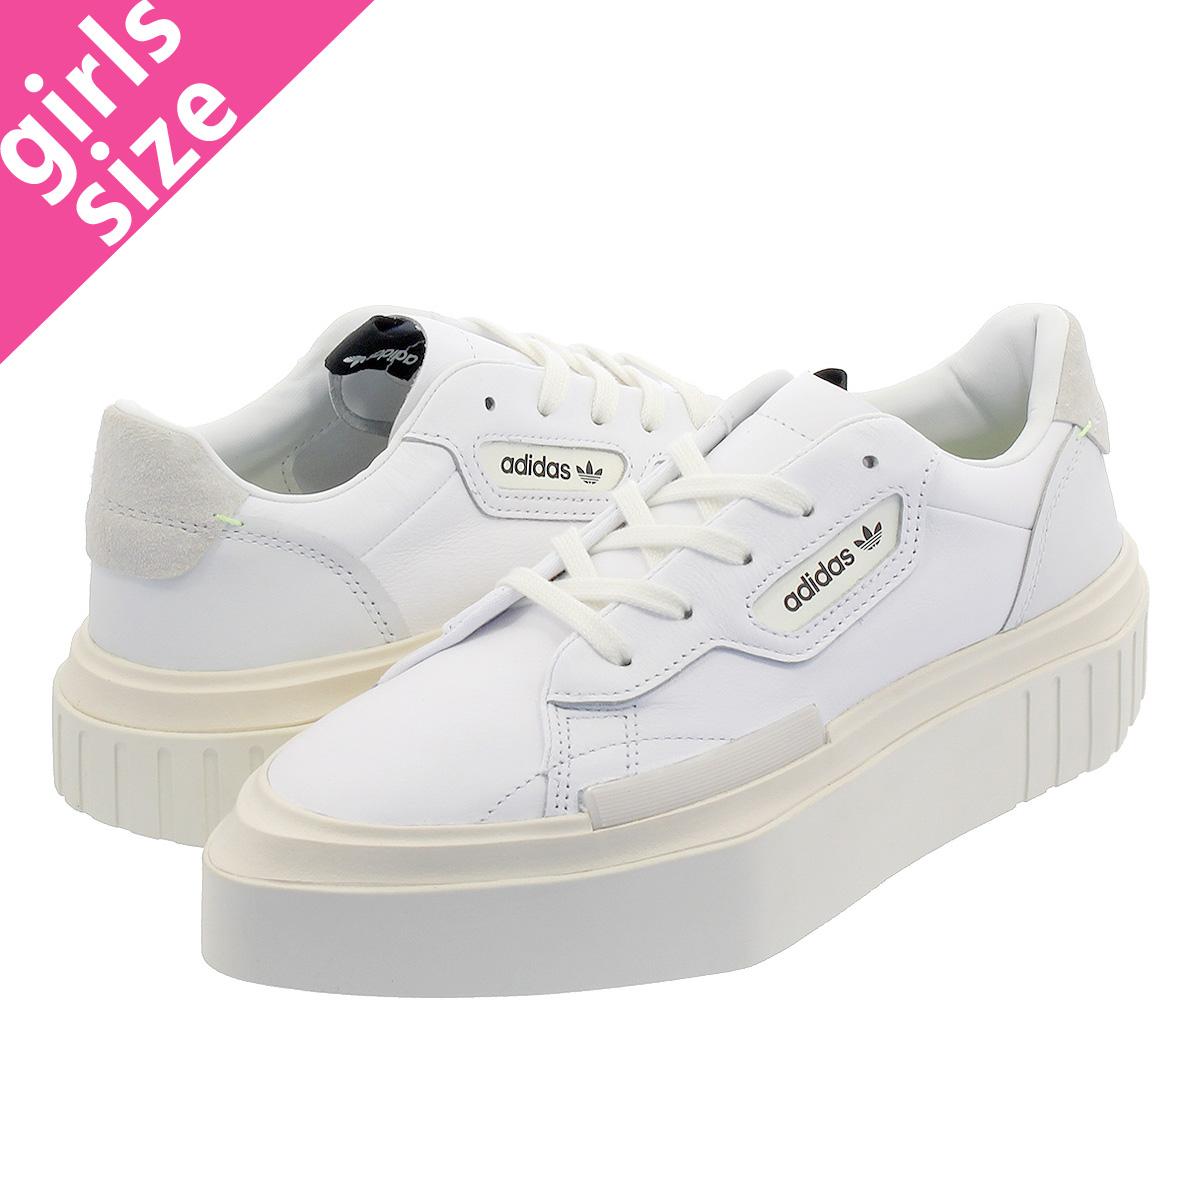 purchase cheap 2f7a5 afcf7 adidas HYPERSLEEK W Adidas hyper leak women RUNNING WHITEOFF WHITECRYSTAL  WHITE g54050